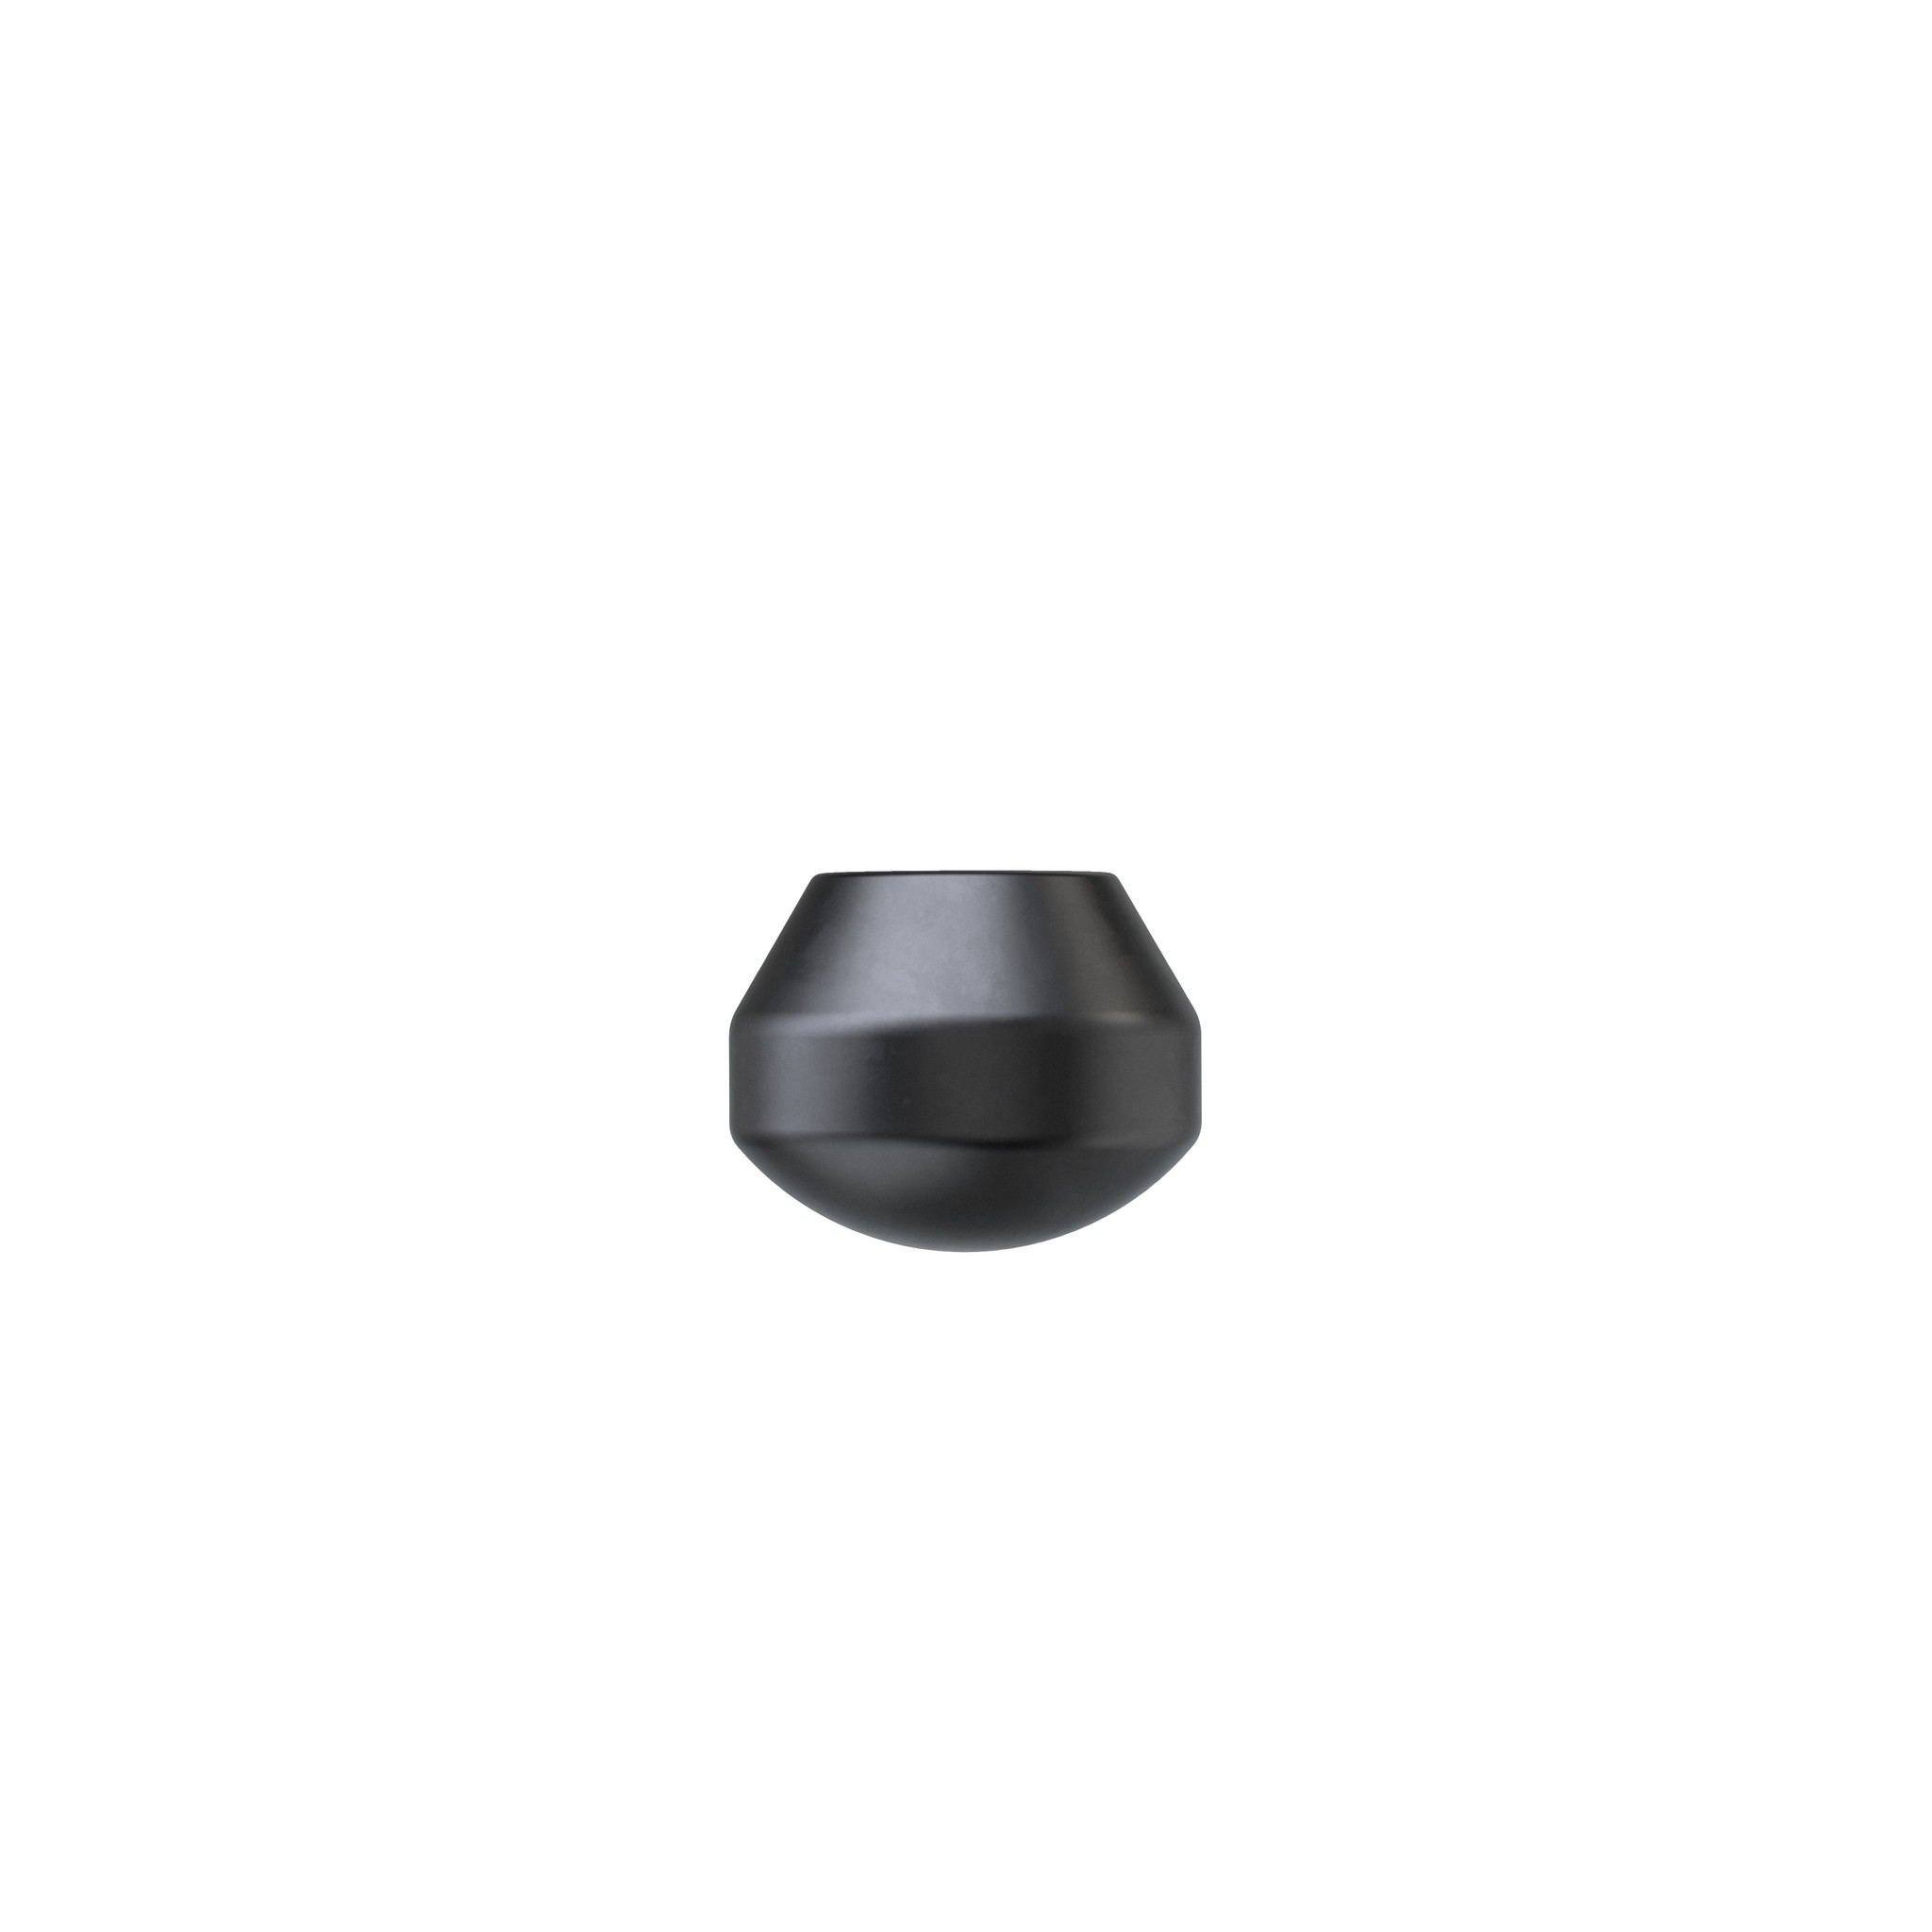 Theragun® THERA1255 Theragun Attachments - Dampener